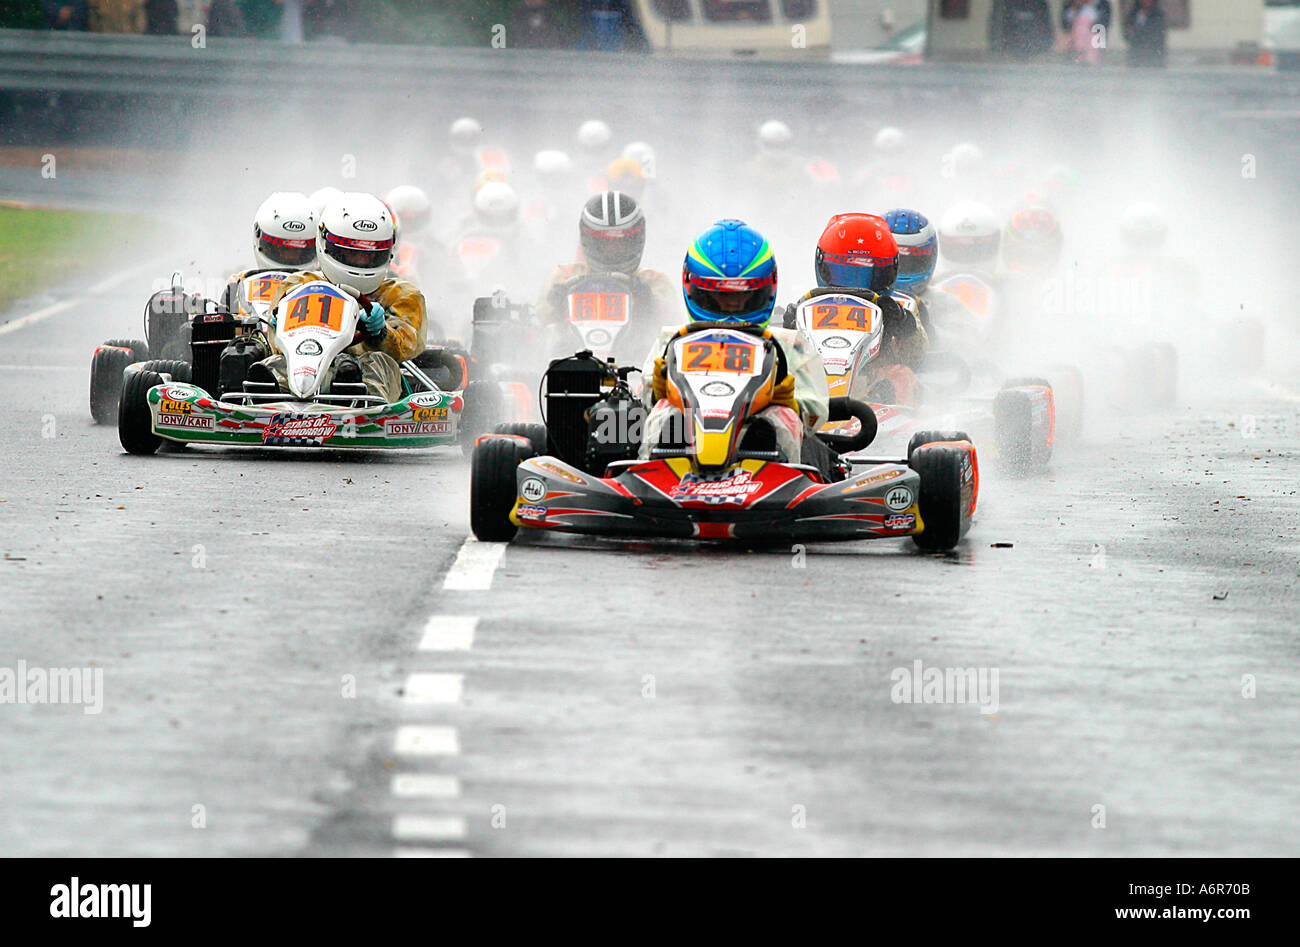 Mini Max Go Kart racing on wet race track Stock Photo, Royalty ...